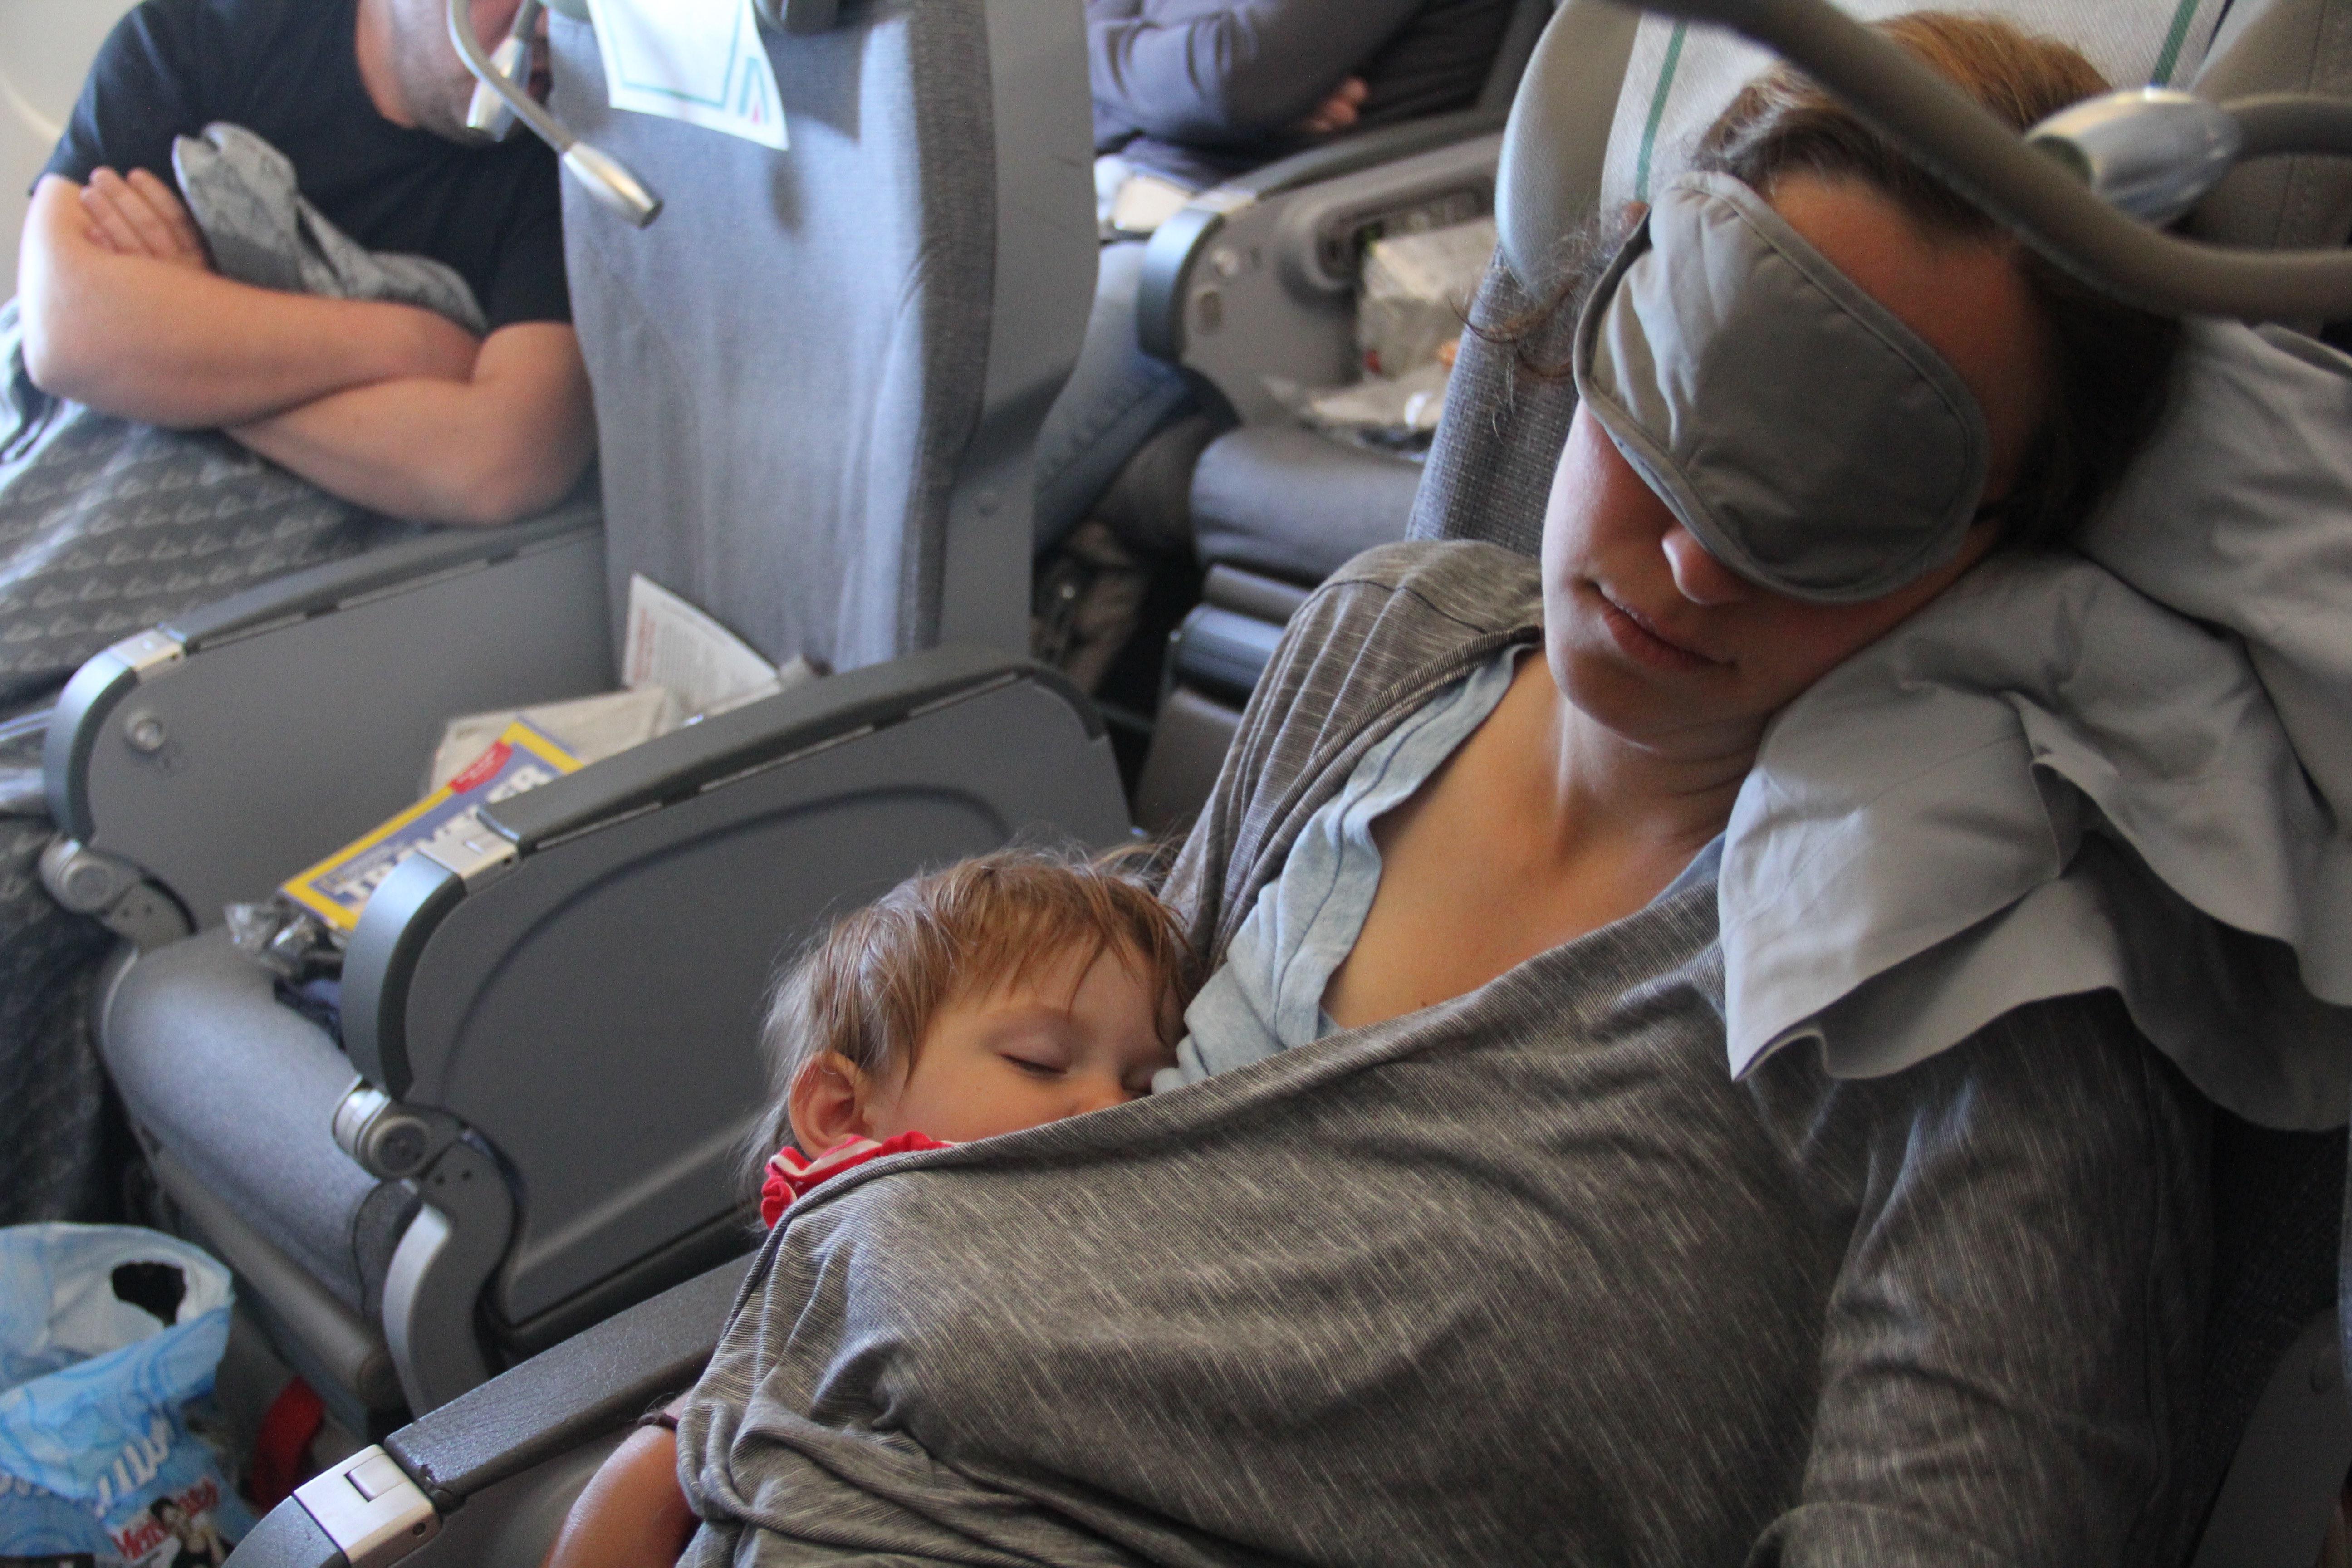 sleeping on the airplane